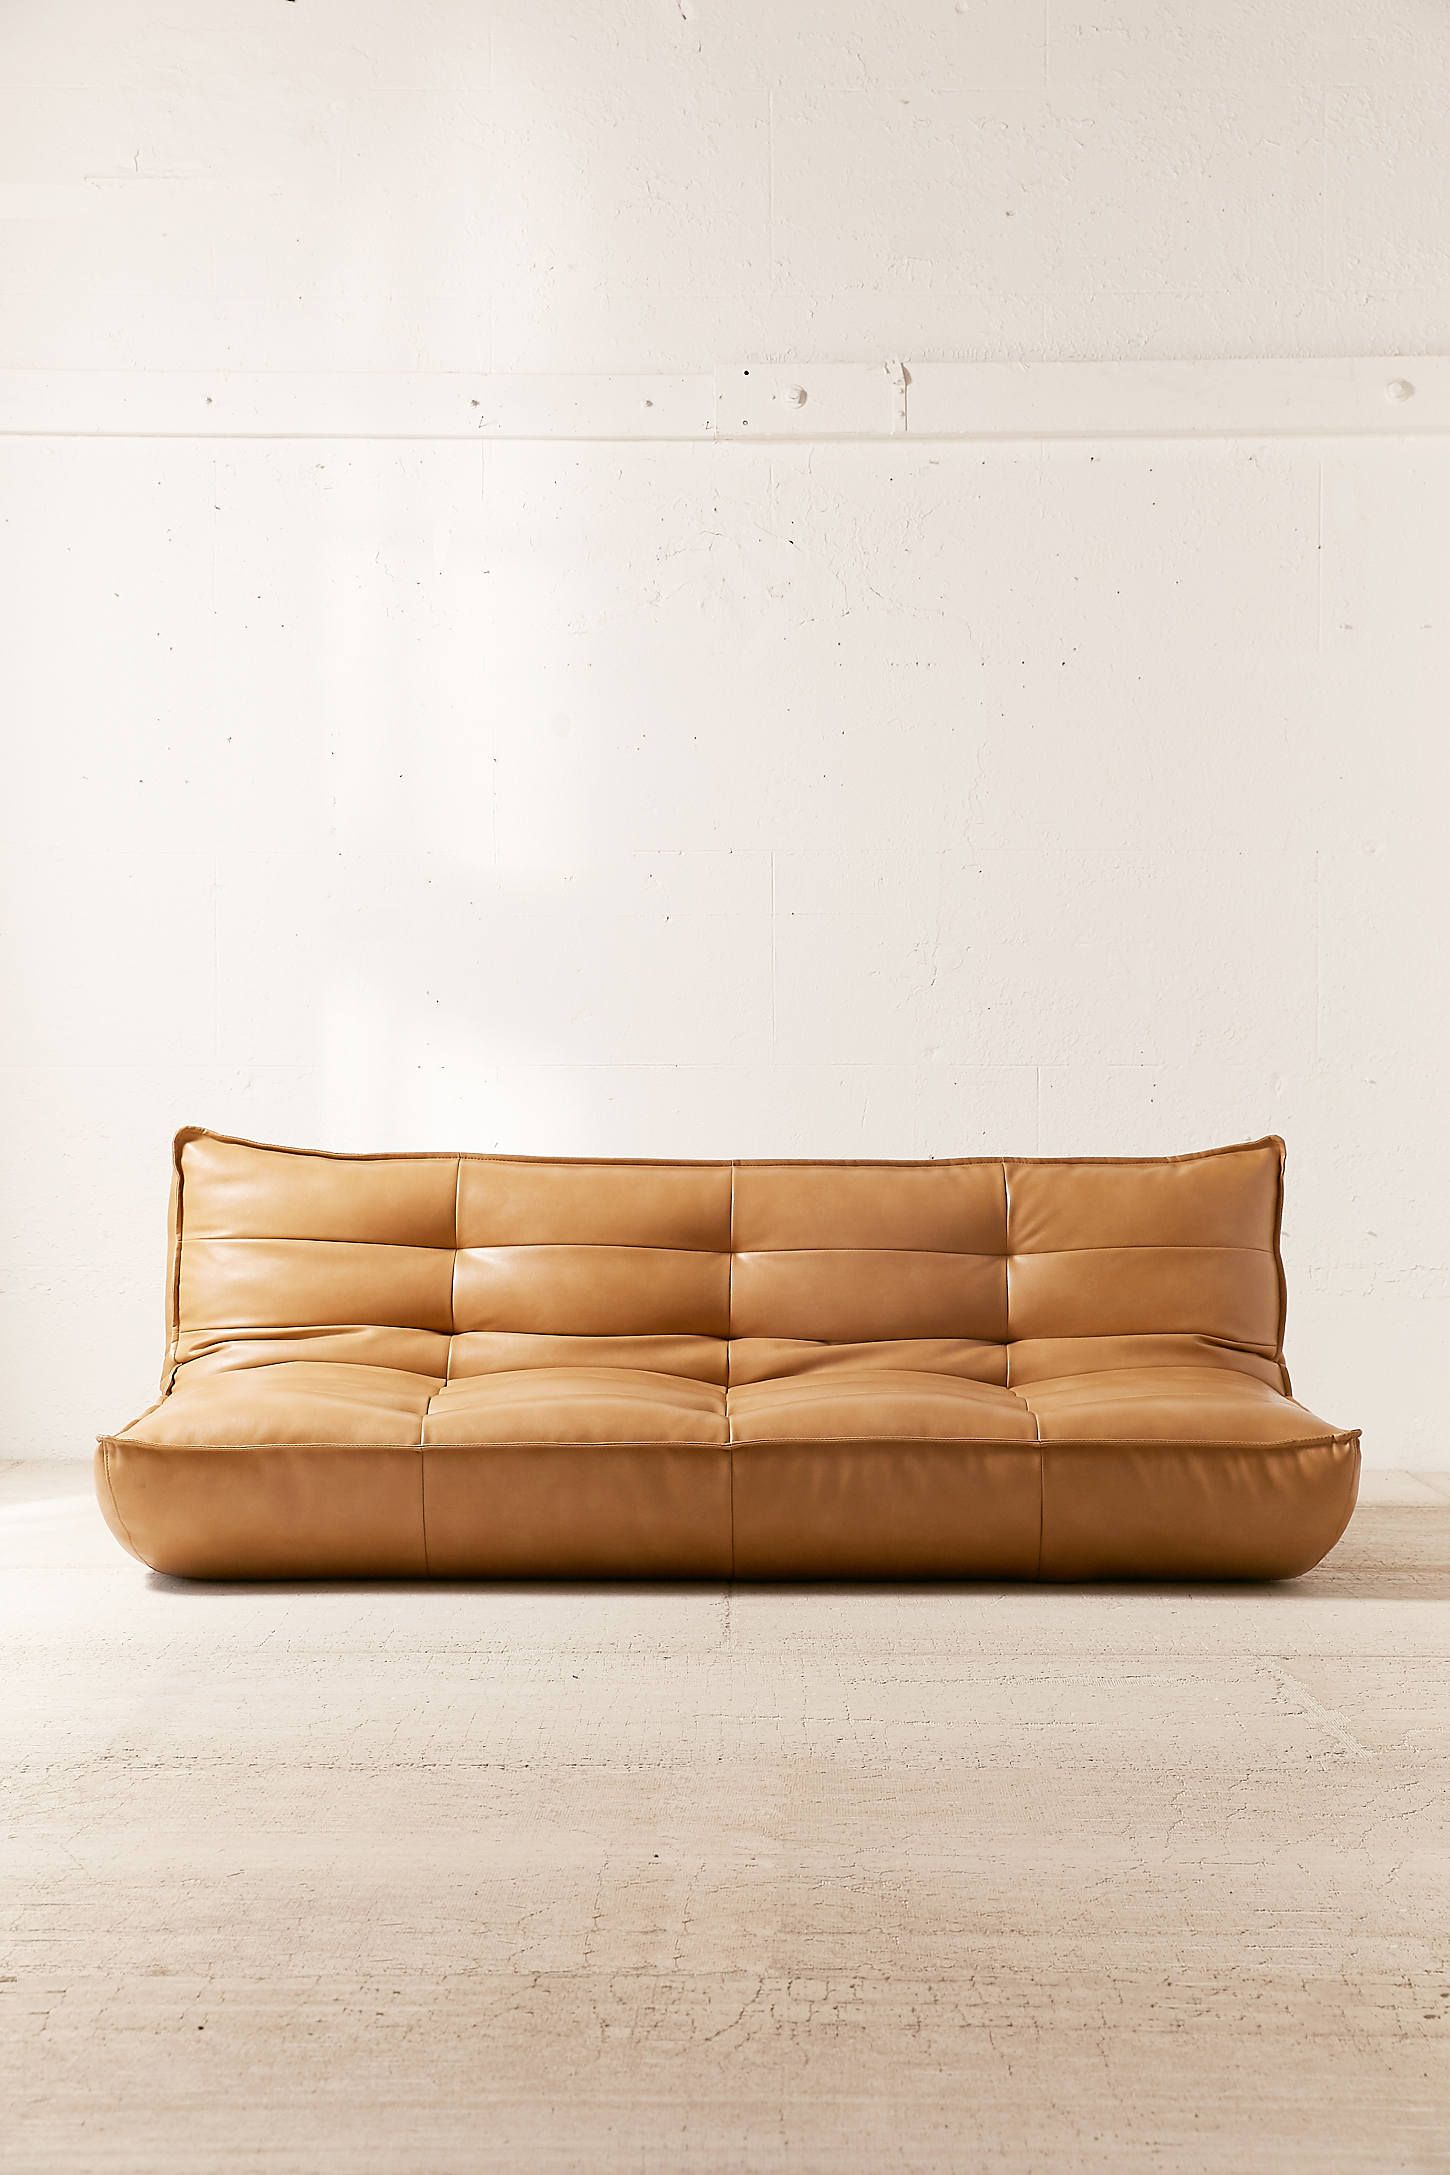 Greta Recycled Leather Xl Sleeper Sofa Urban Outfitters Leather Sleeper Sofa Sleeper Sofa Leather Sofa